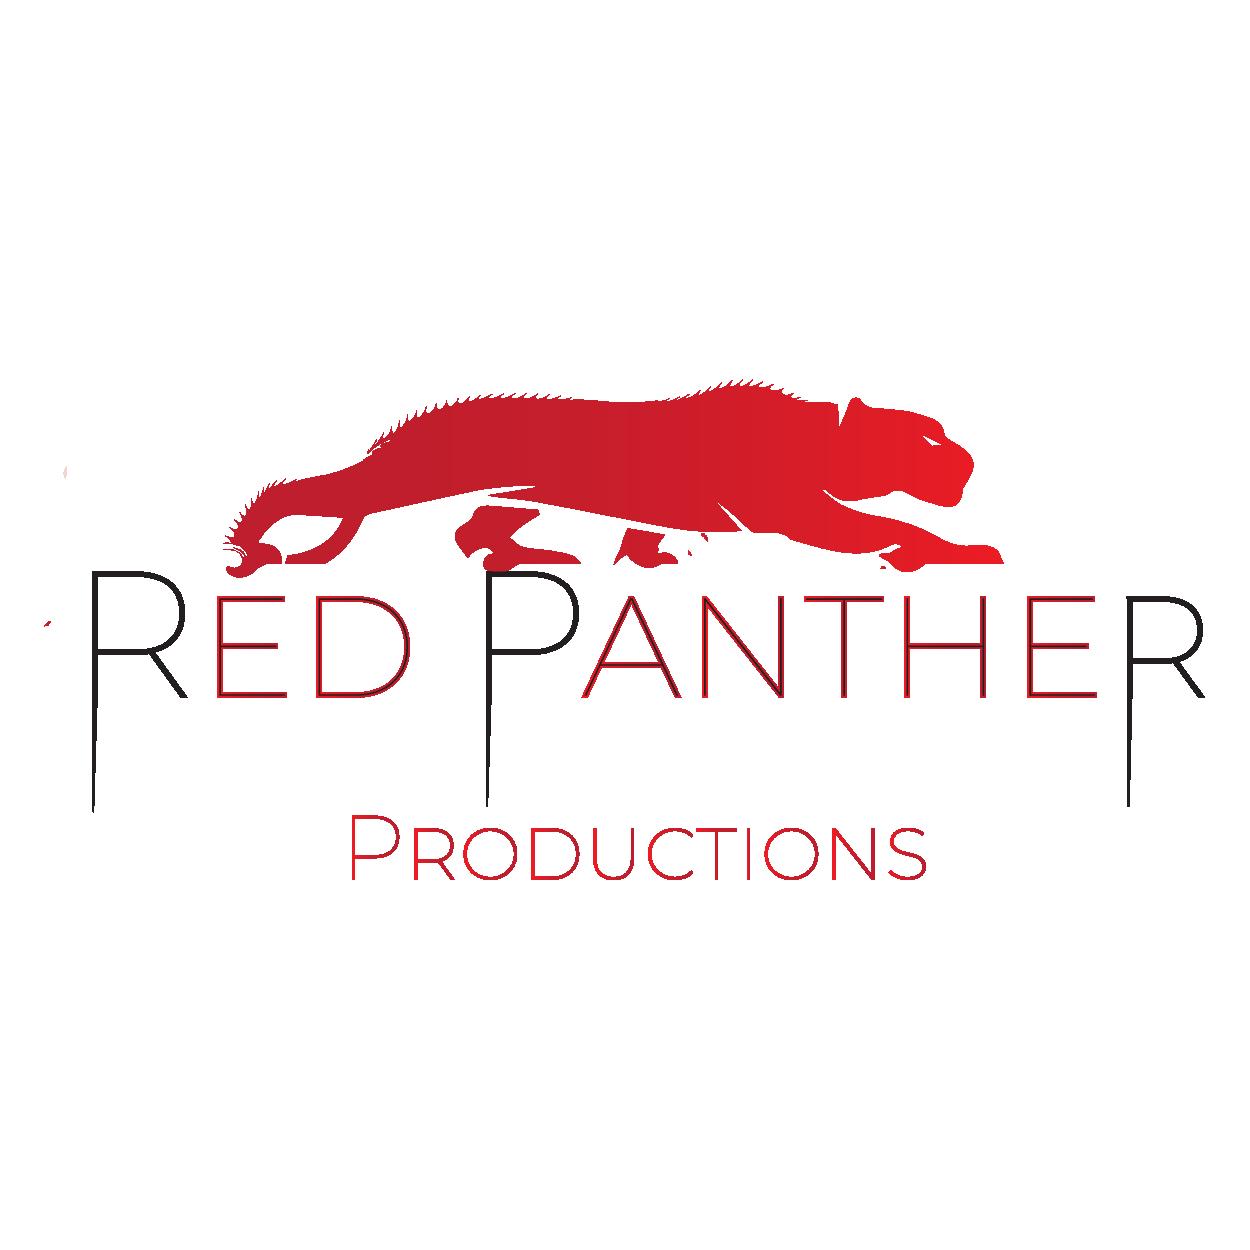 Red Panther Tweak v2.png